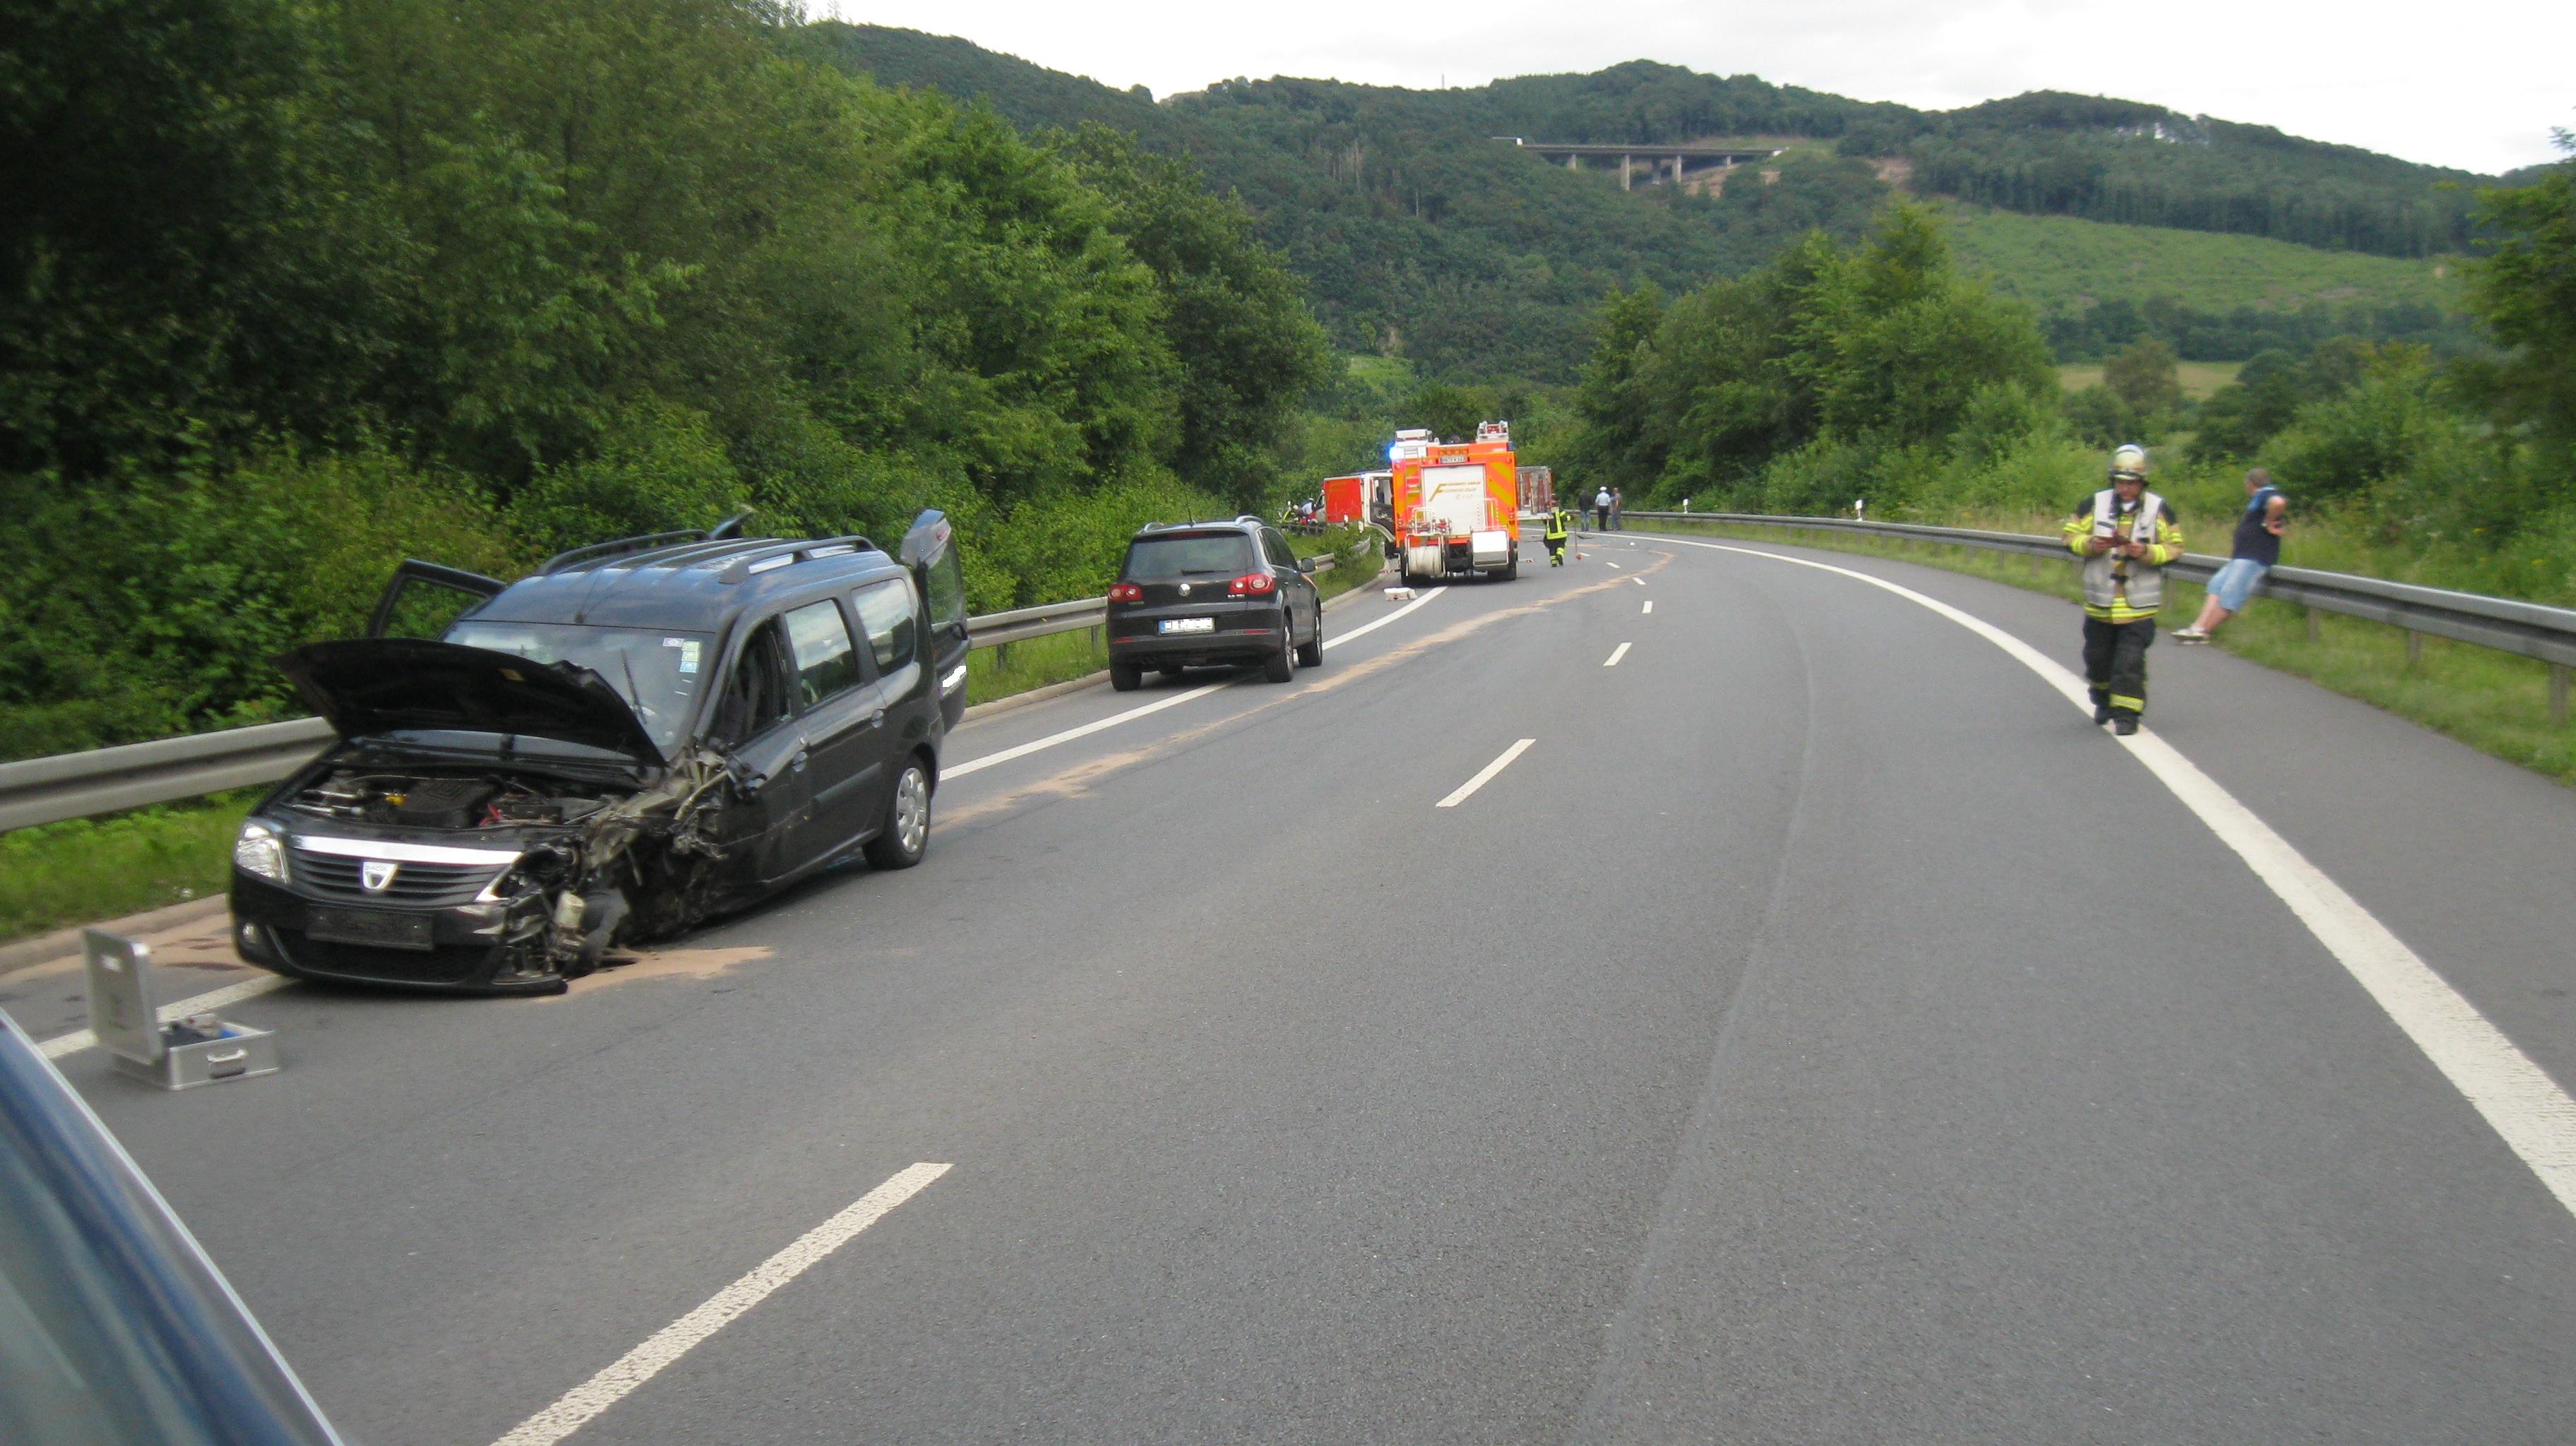 Verkehrsunfall mit vier Verletzten. (Foto: OTS)